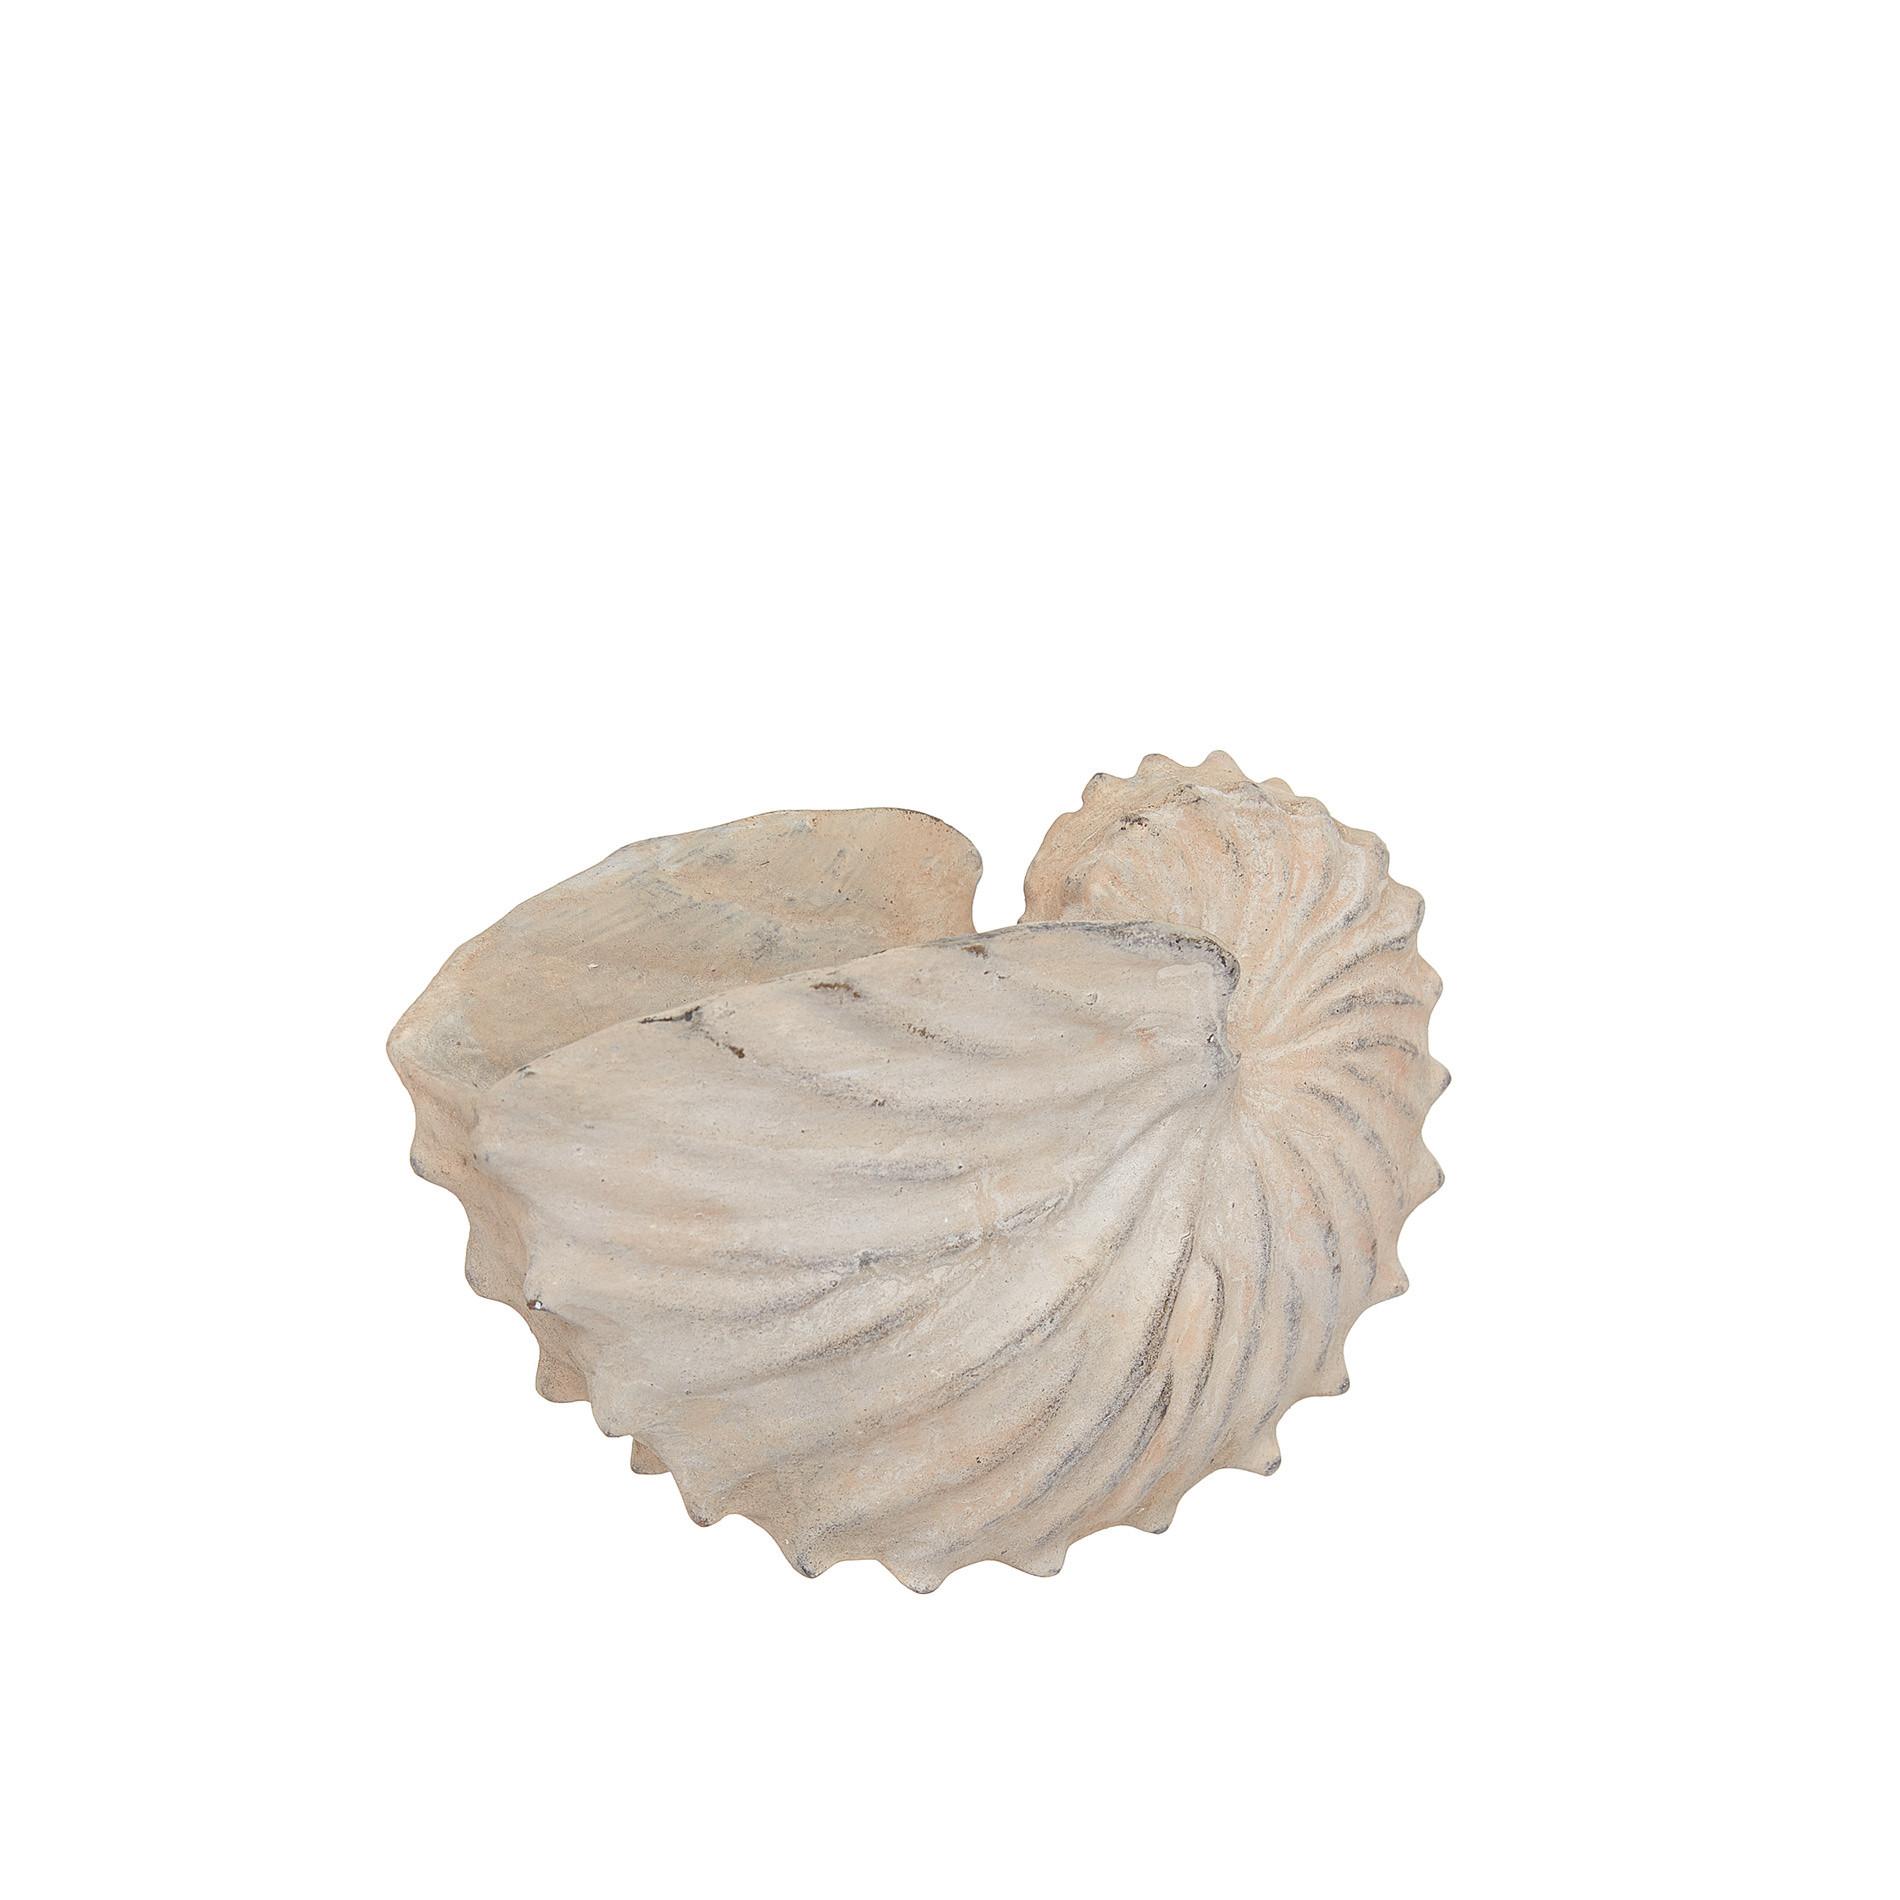 Conchiglia decorativa rifinita a mano, Bianco, large image number 0